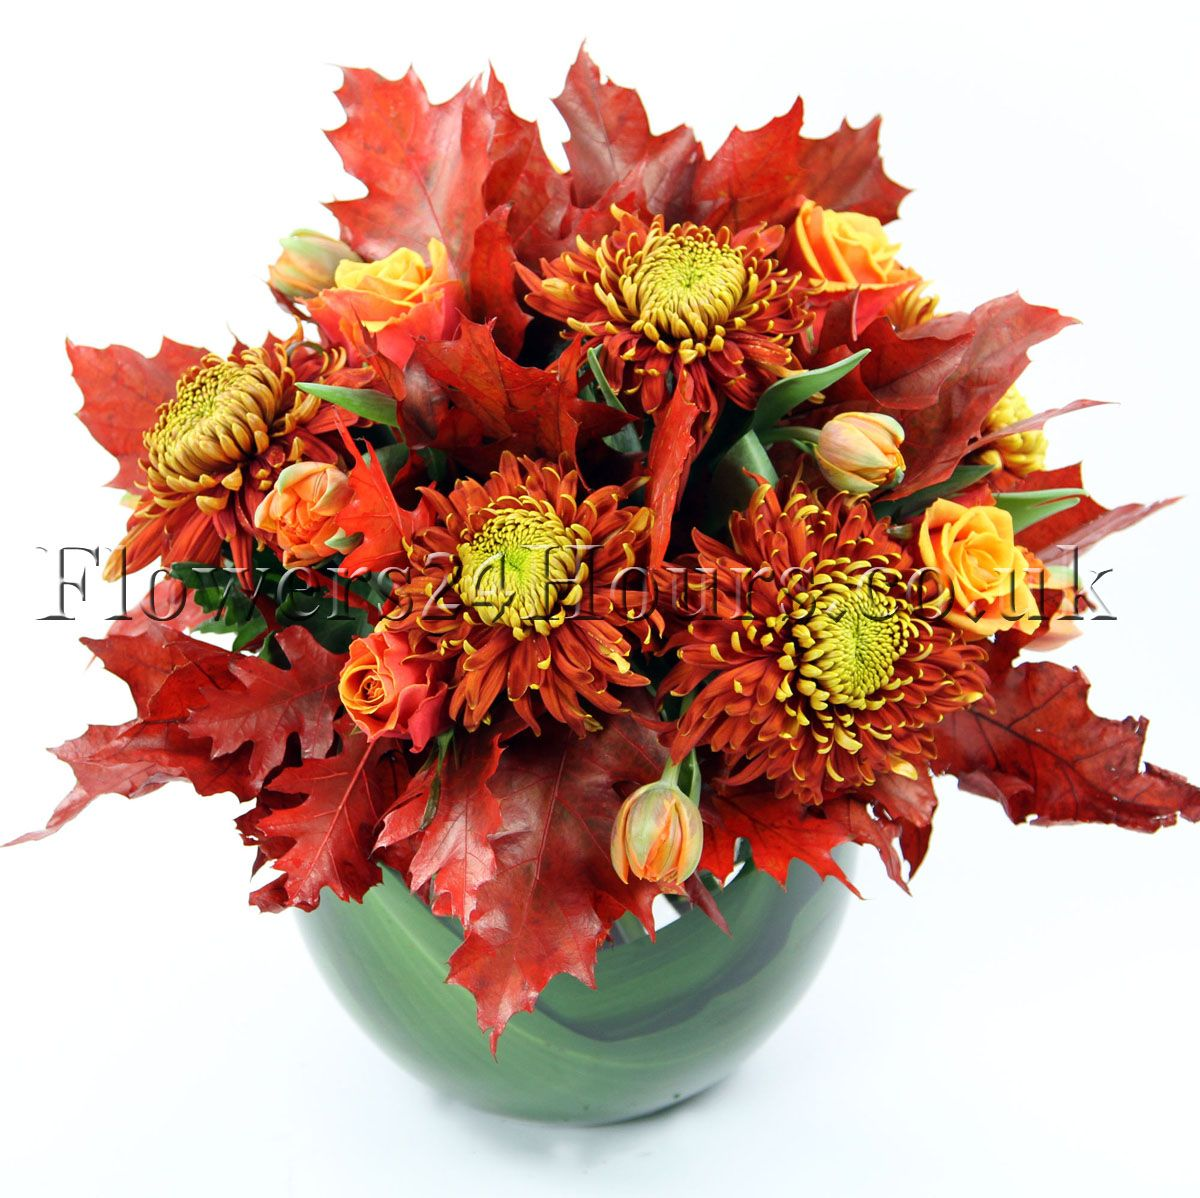 Autumn Flowers Gifts Wedding Flower Photos Same Day Flower Delivery Flower Delivery